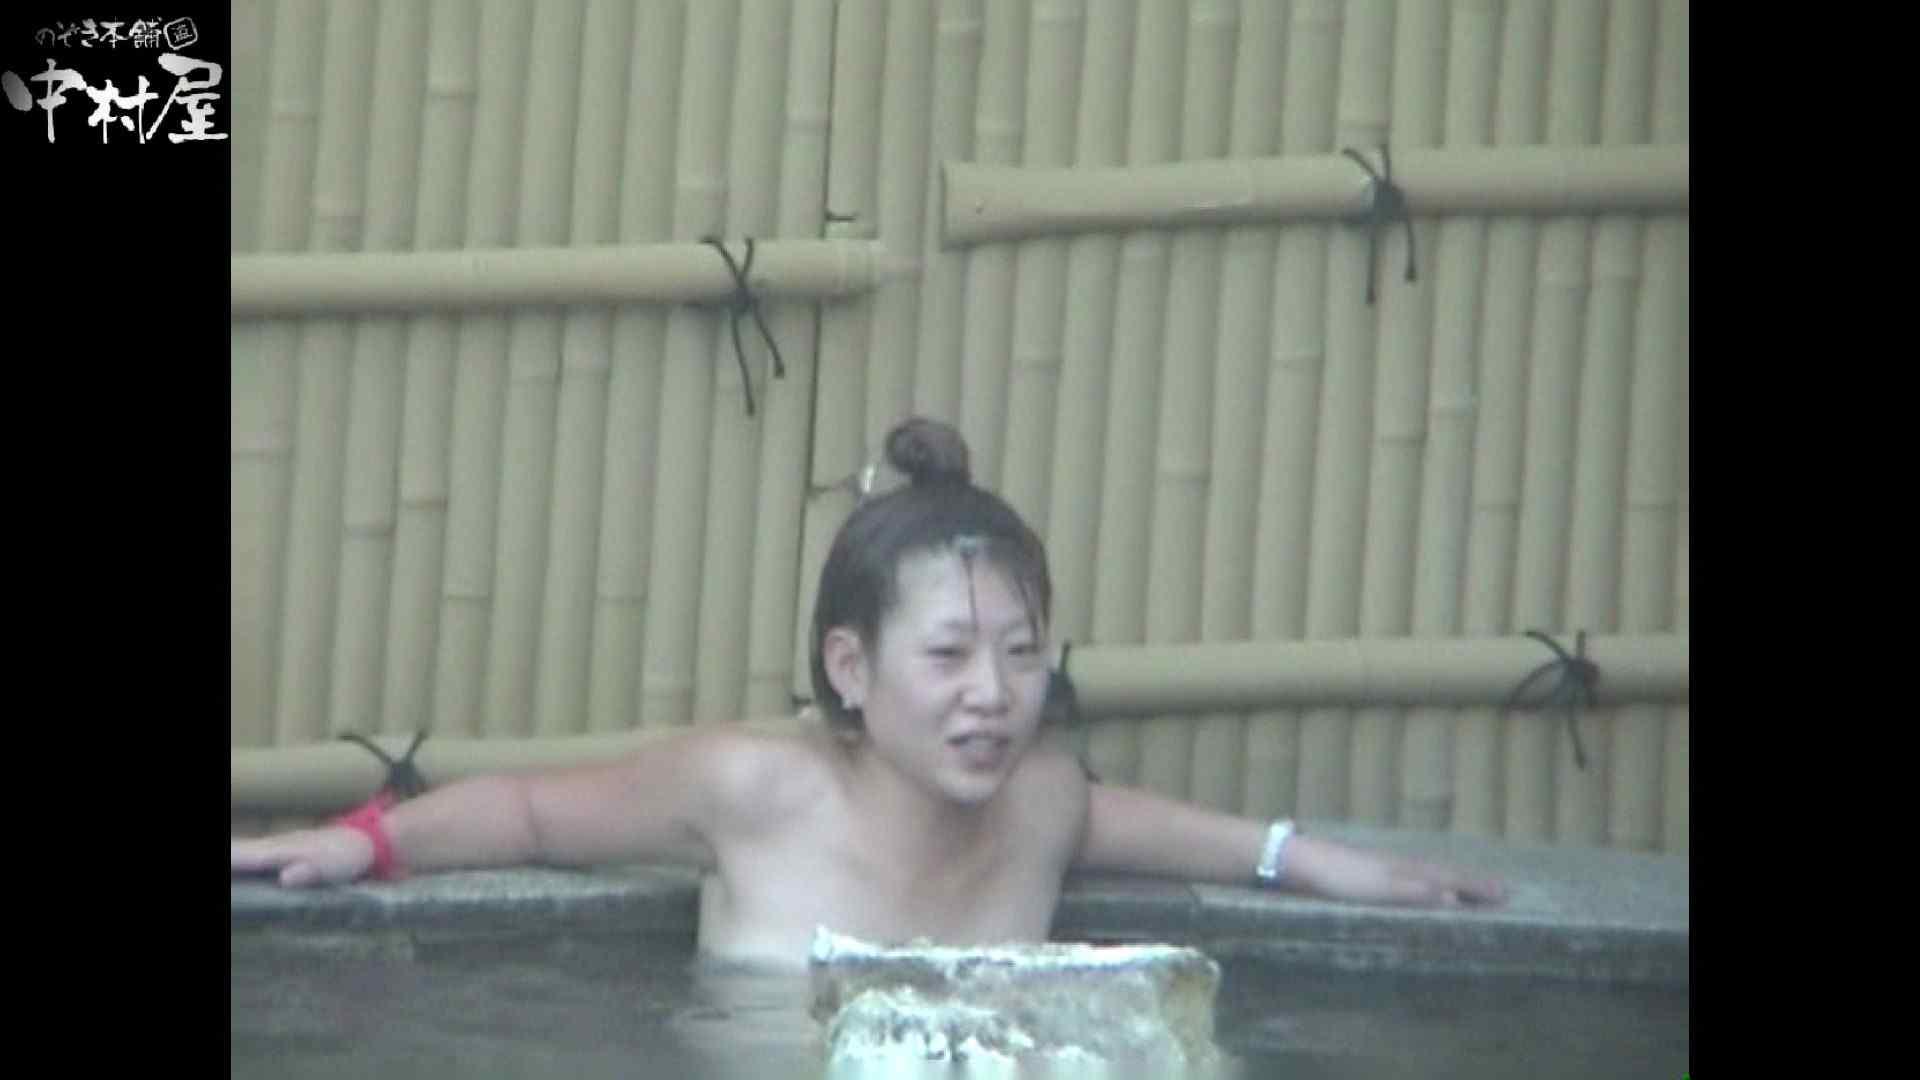 Aquaな露天風呂Vol.974 盗撮シリーズ | 露天風呂編  104PIX 75